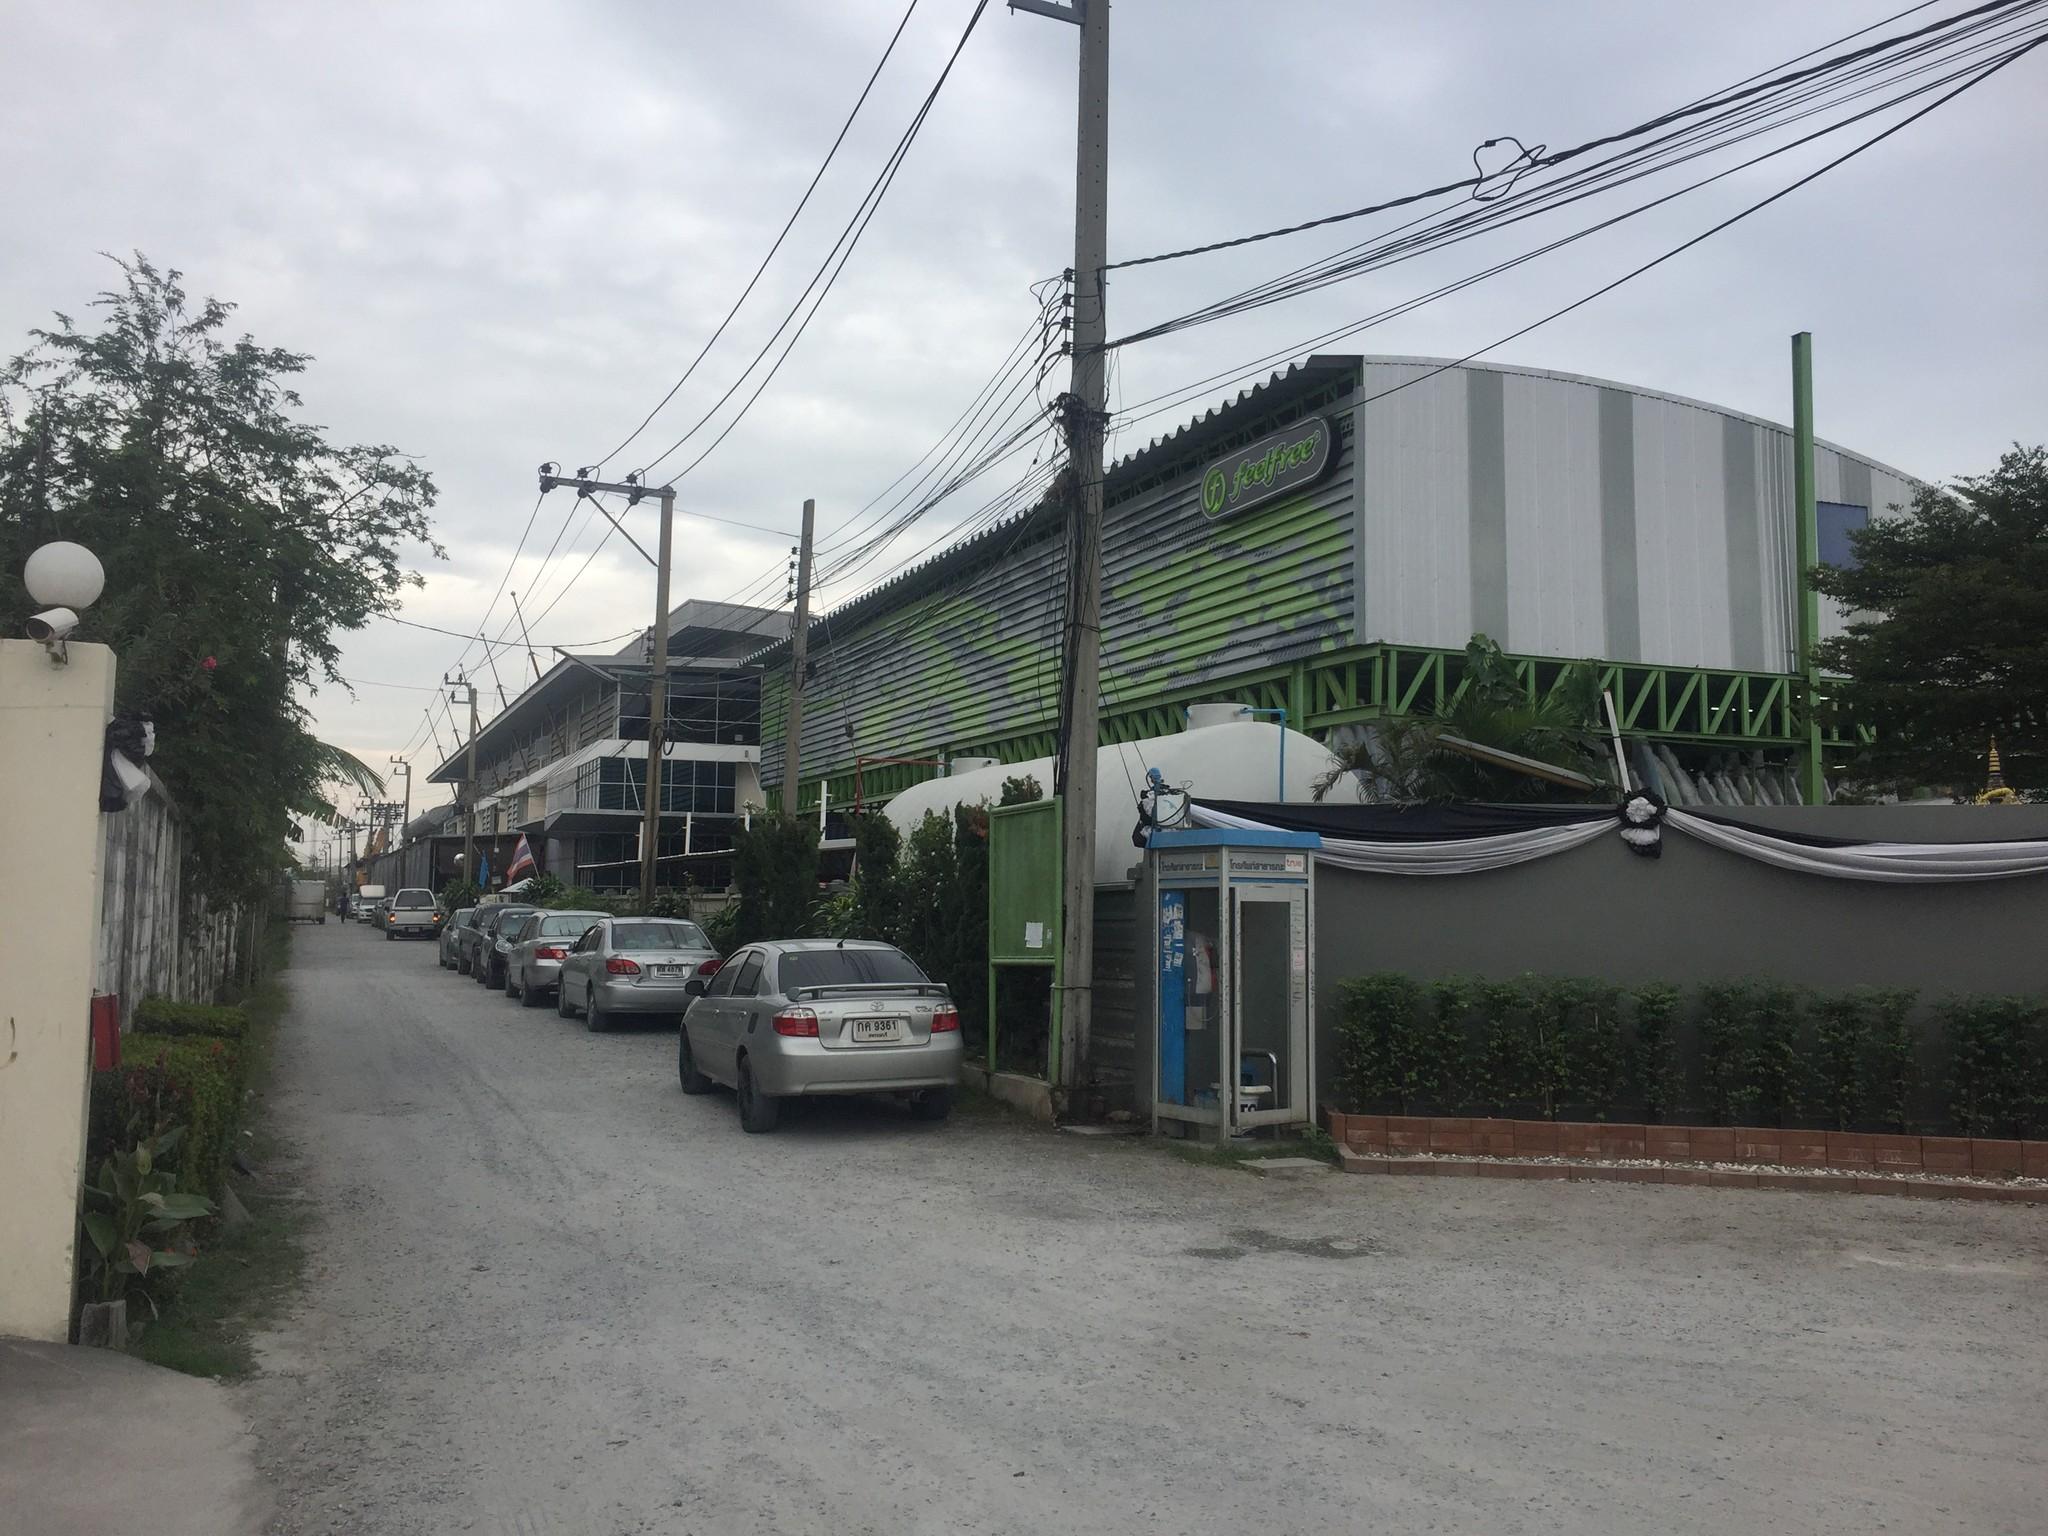 Feelfree fabriek